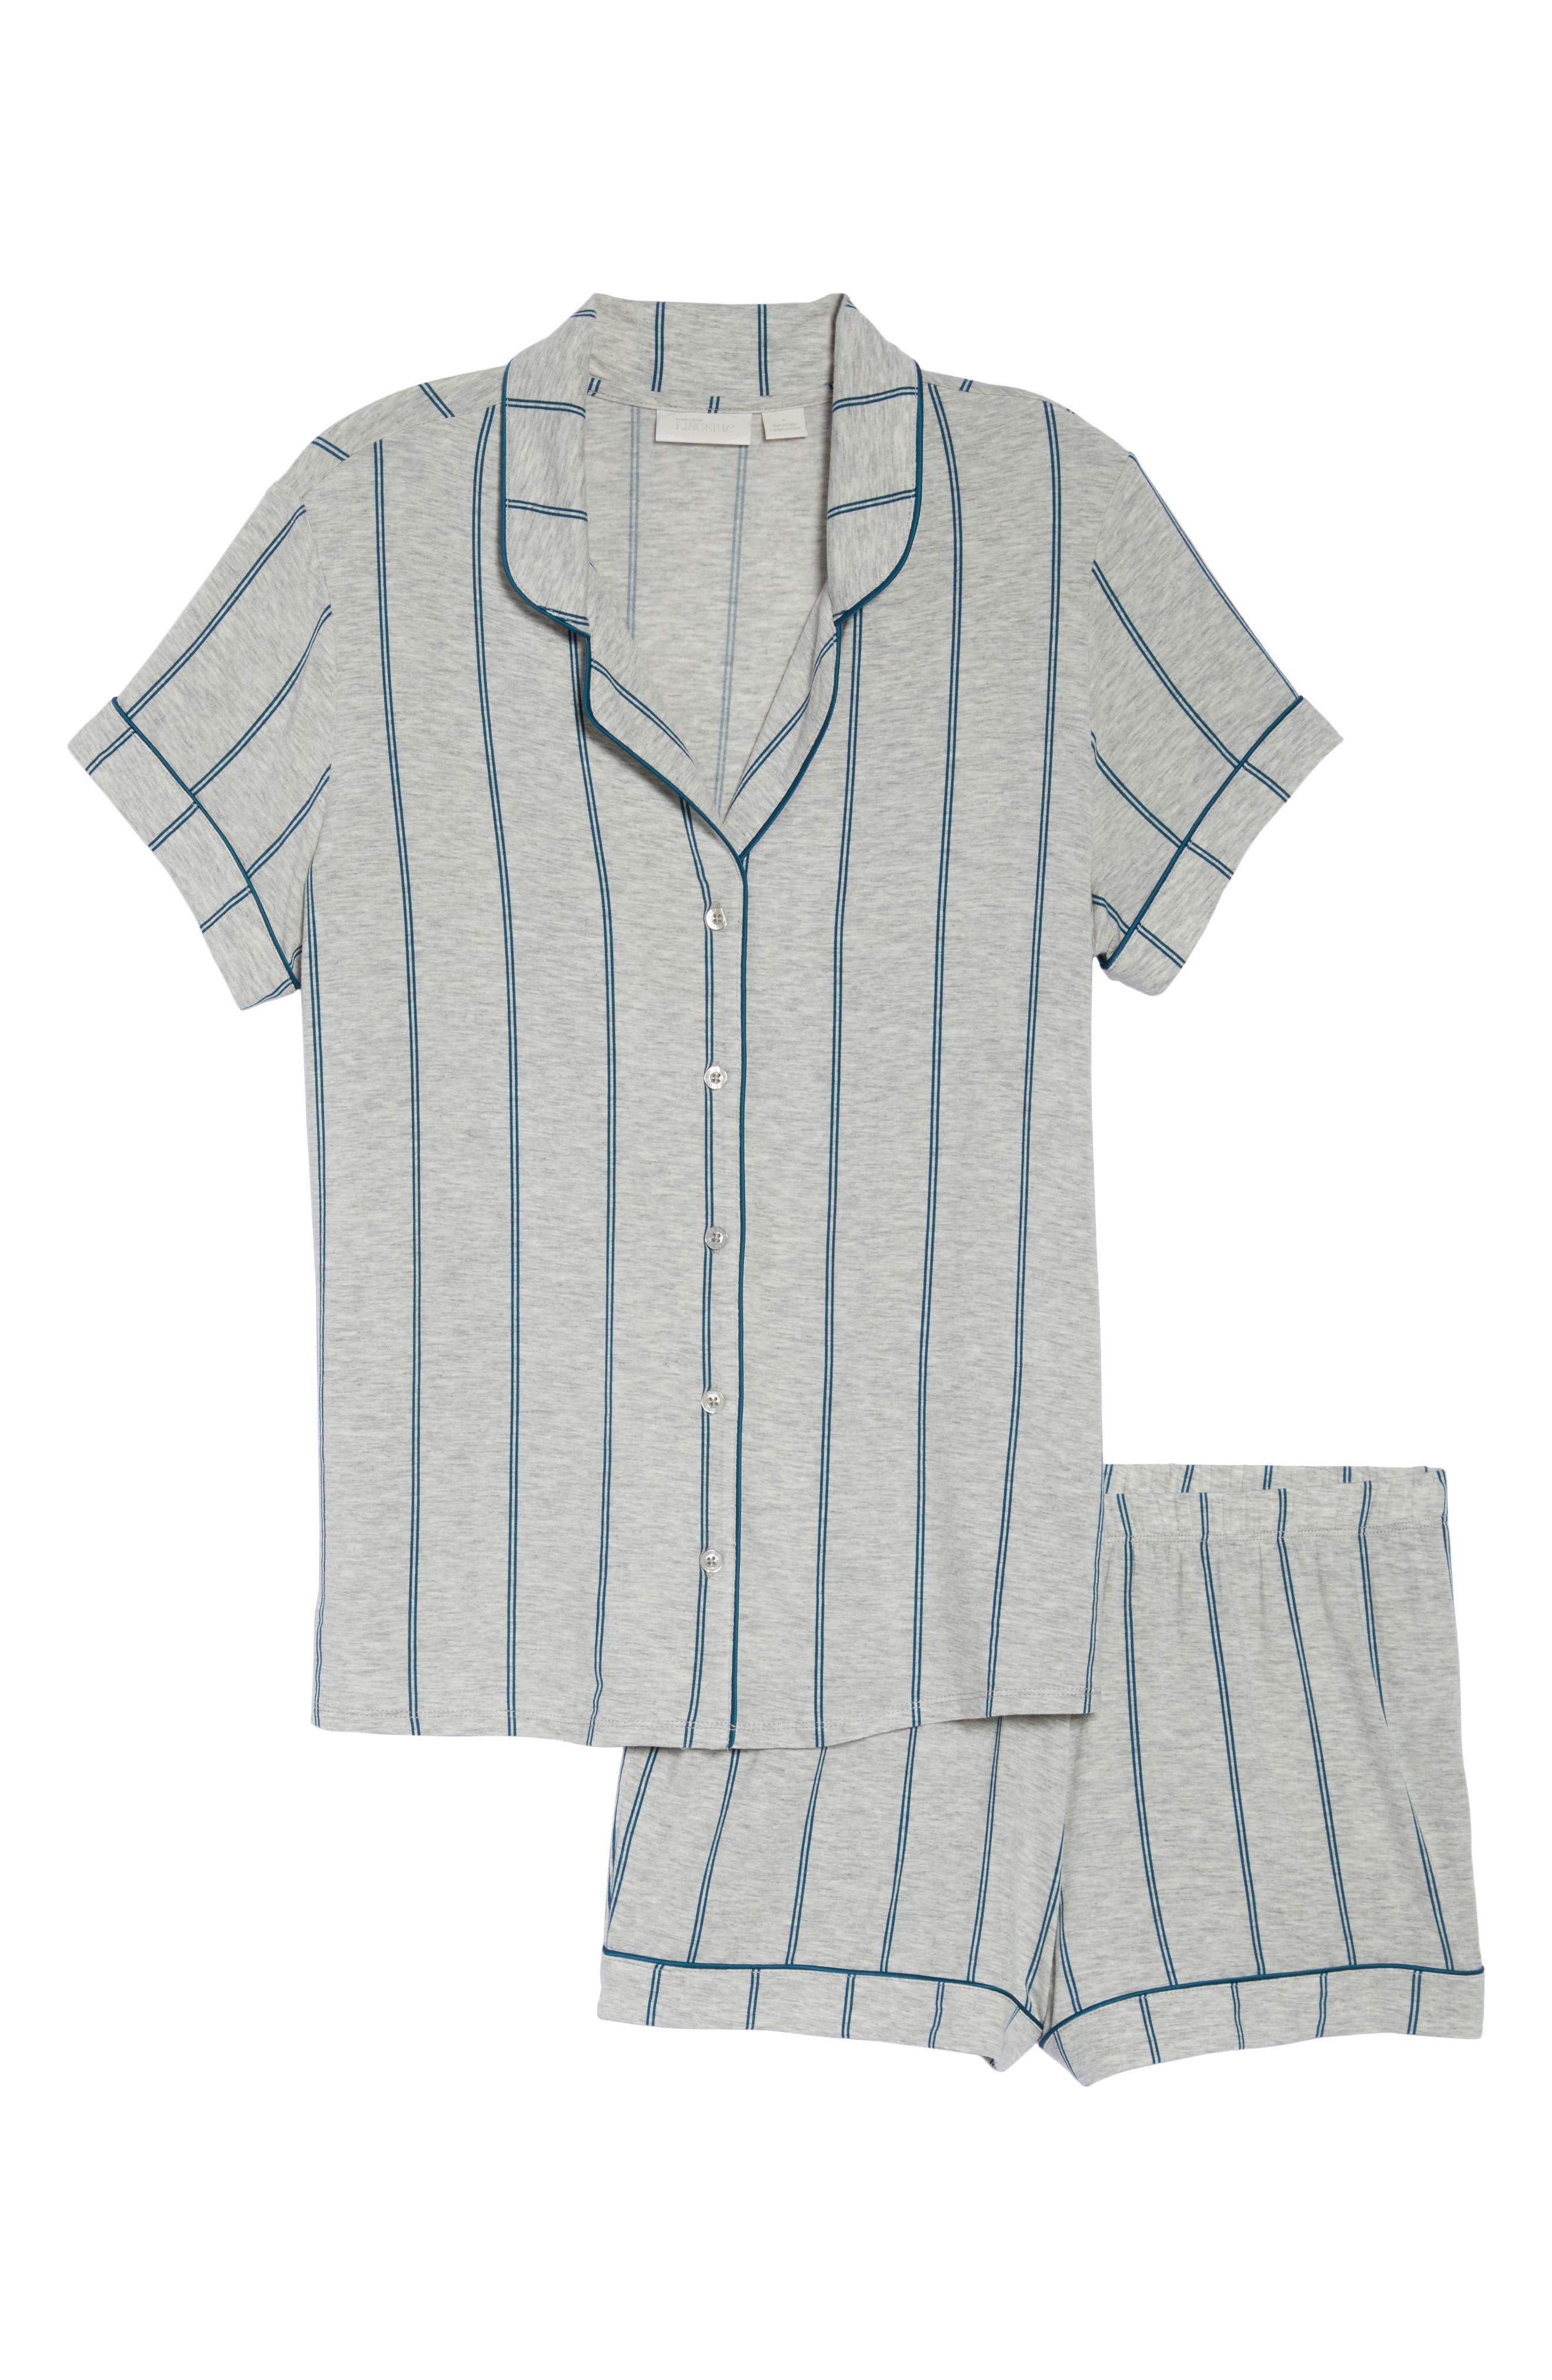 NORDSTROM LINGERIE, Moonlight Short Pajamas, Alternate thumbnail 6, color, GREY PEARL HTR MICRO STRIPE